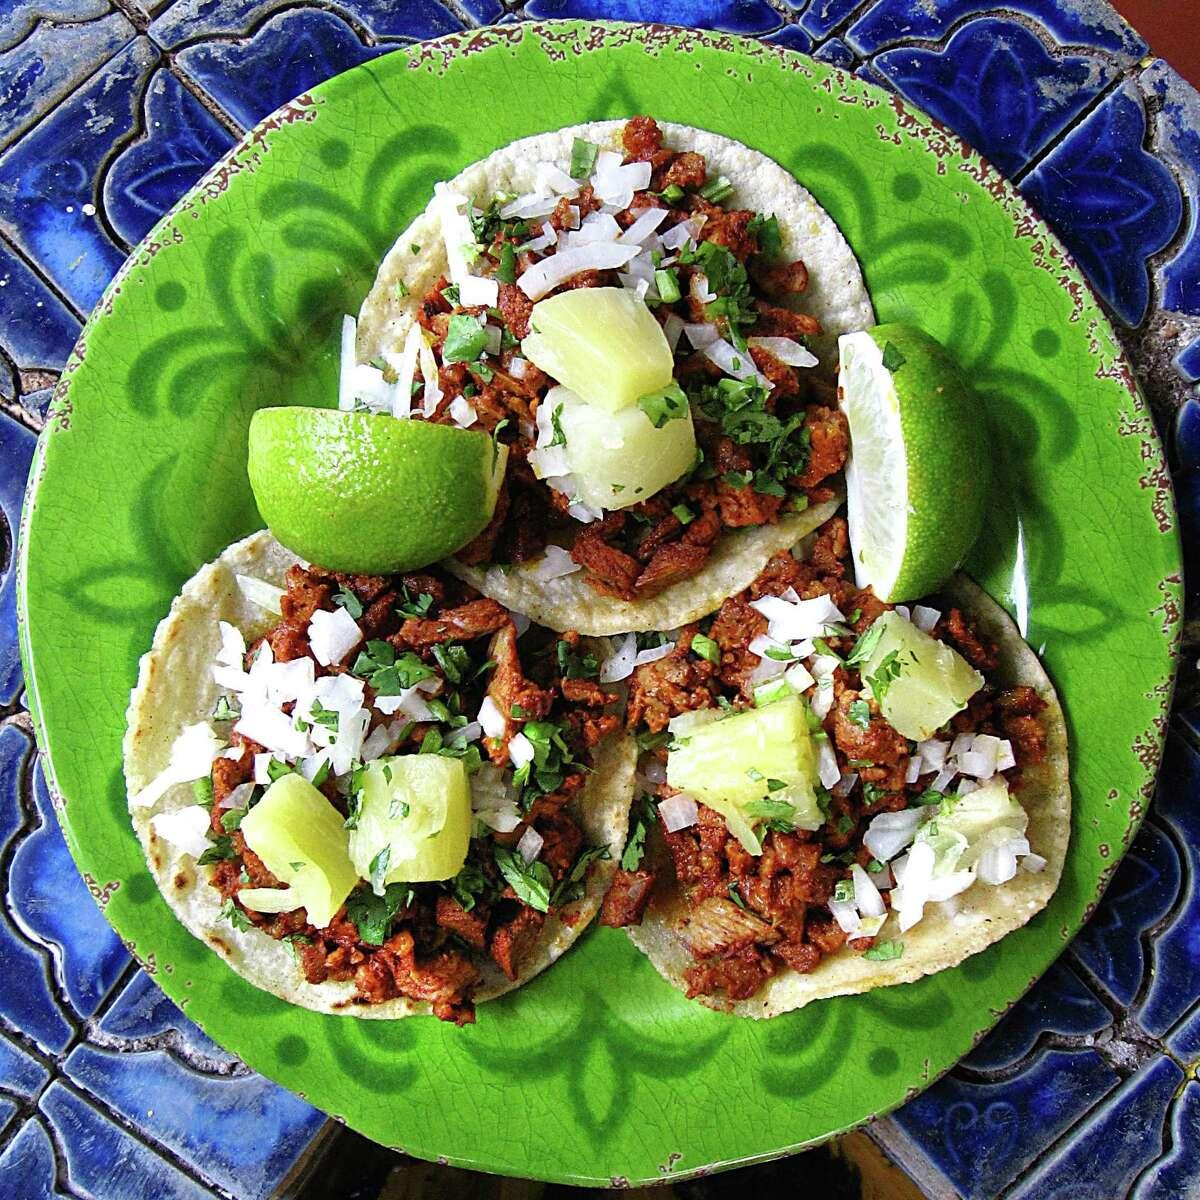 Tacos al pastor with onions, cilantro and pineapple on handmade corn tortillas from El Mirasol.